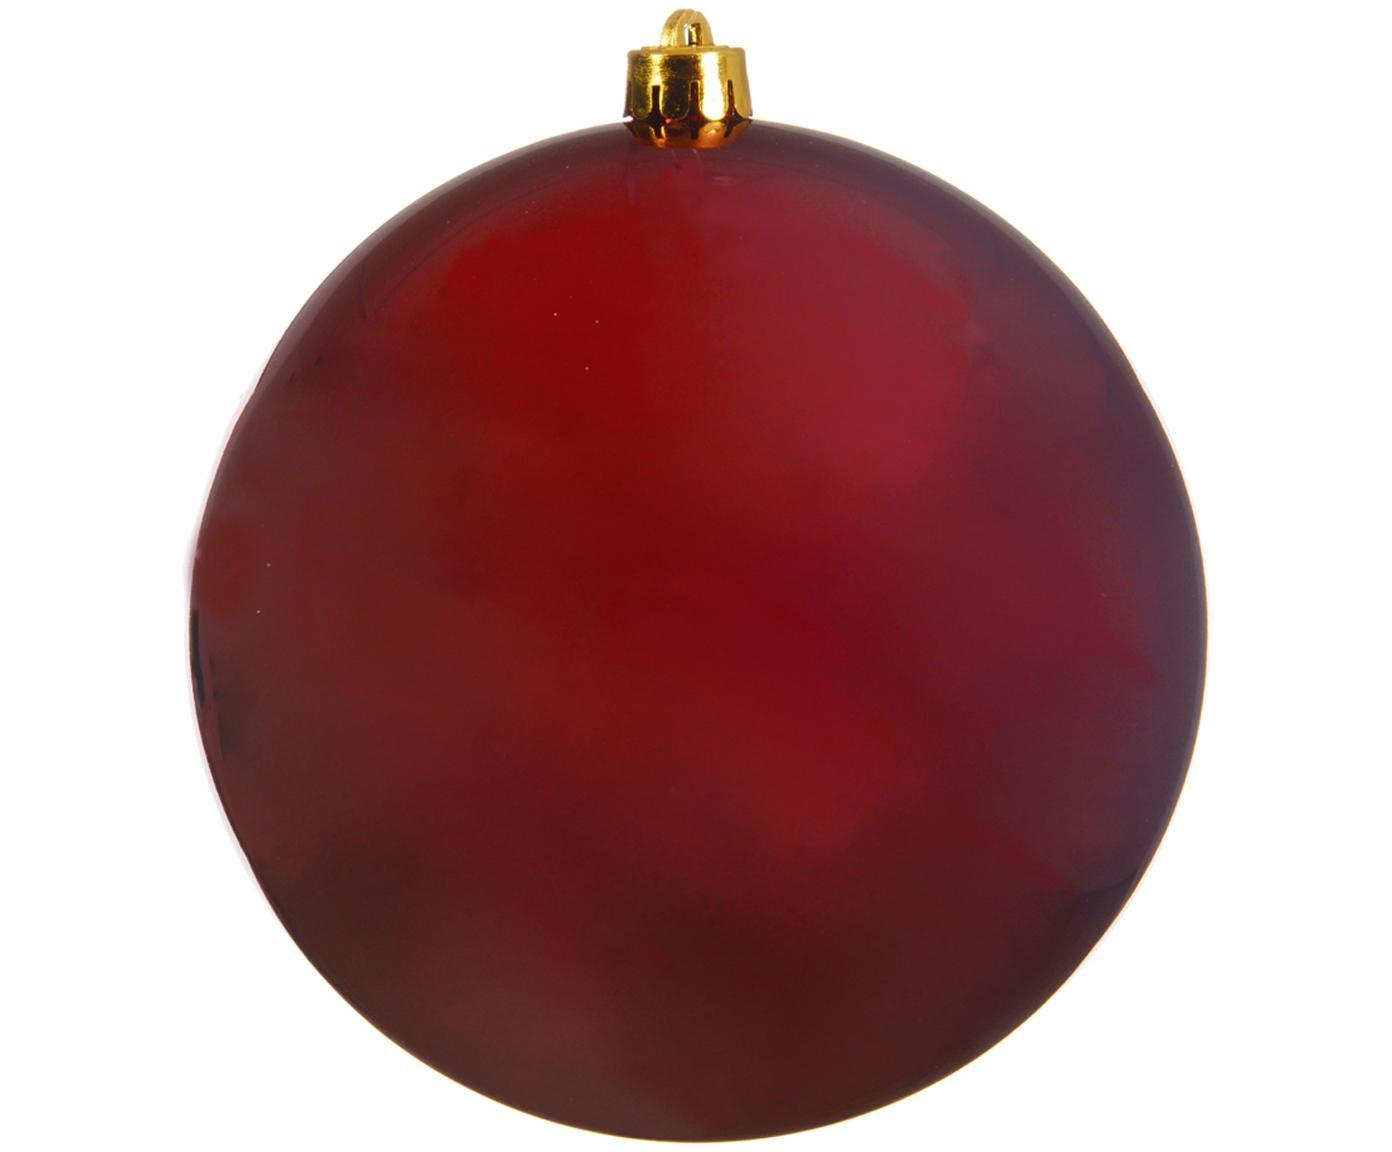 Palla di Natale Minstix Ø 20 cm, Materiale sintetico, Rosso, Ø 20 cm